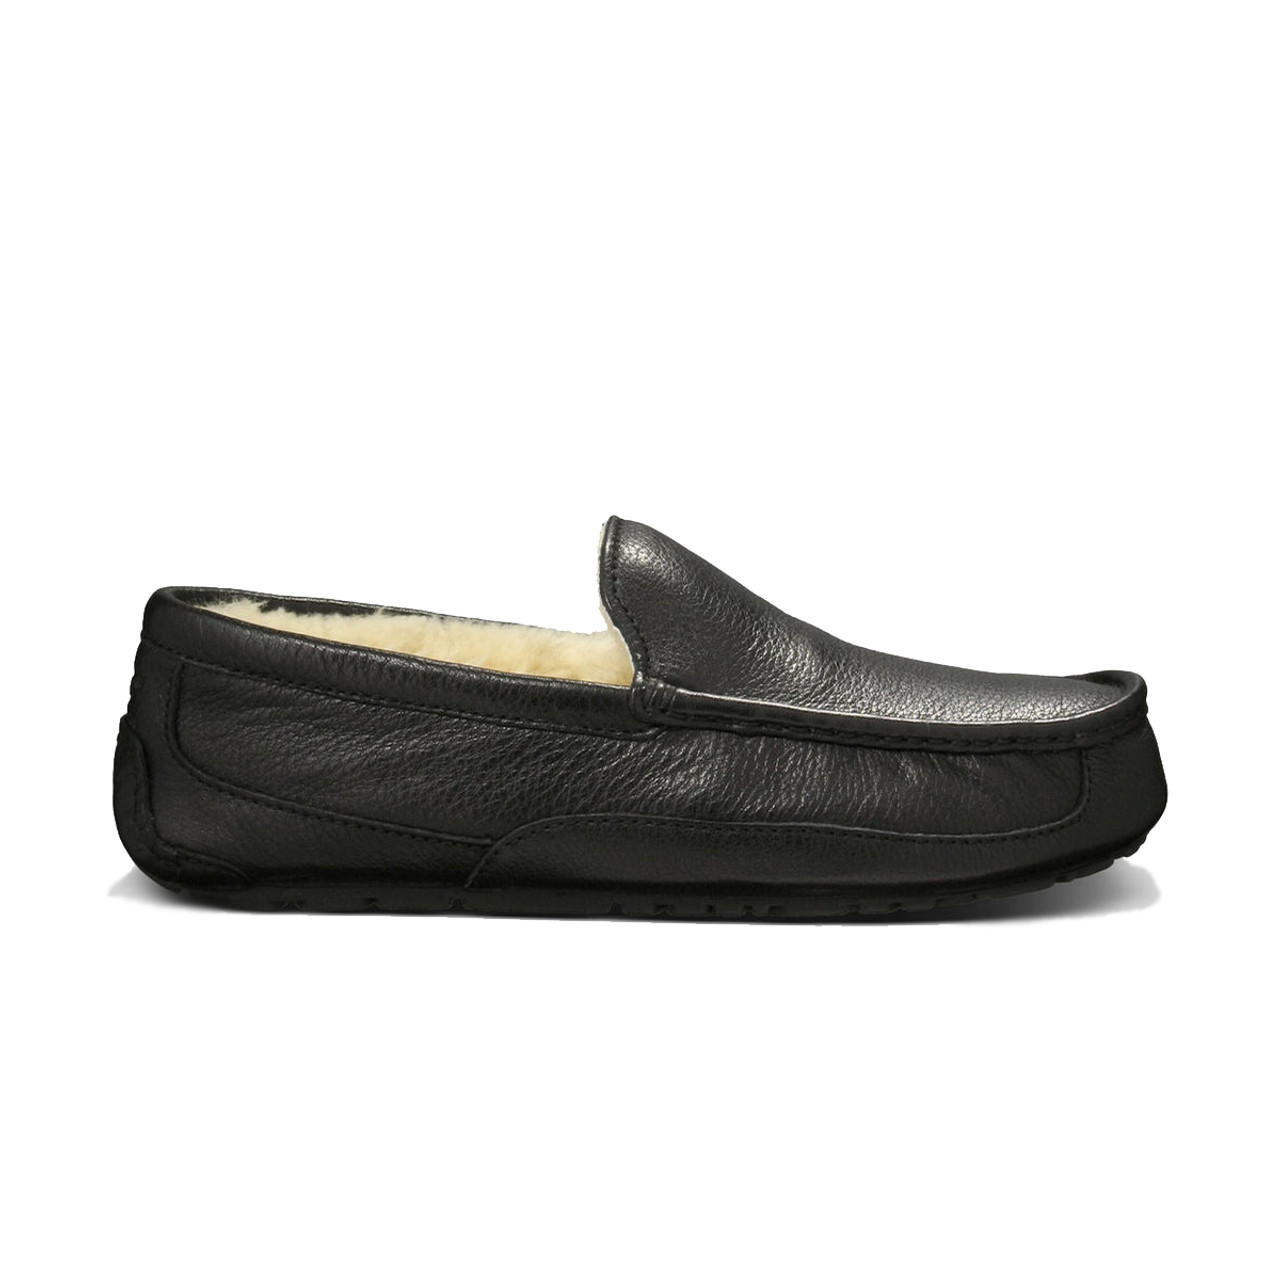 a117db895c0 UGG Ascot Slipper Black Leather Mens 5379B